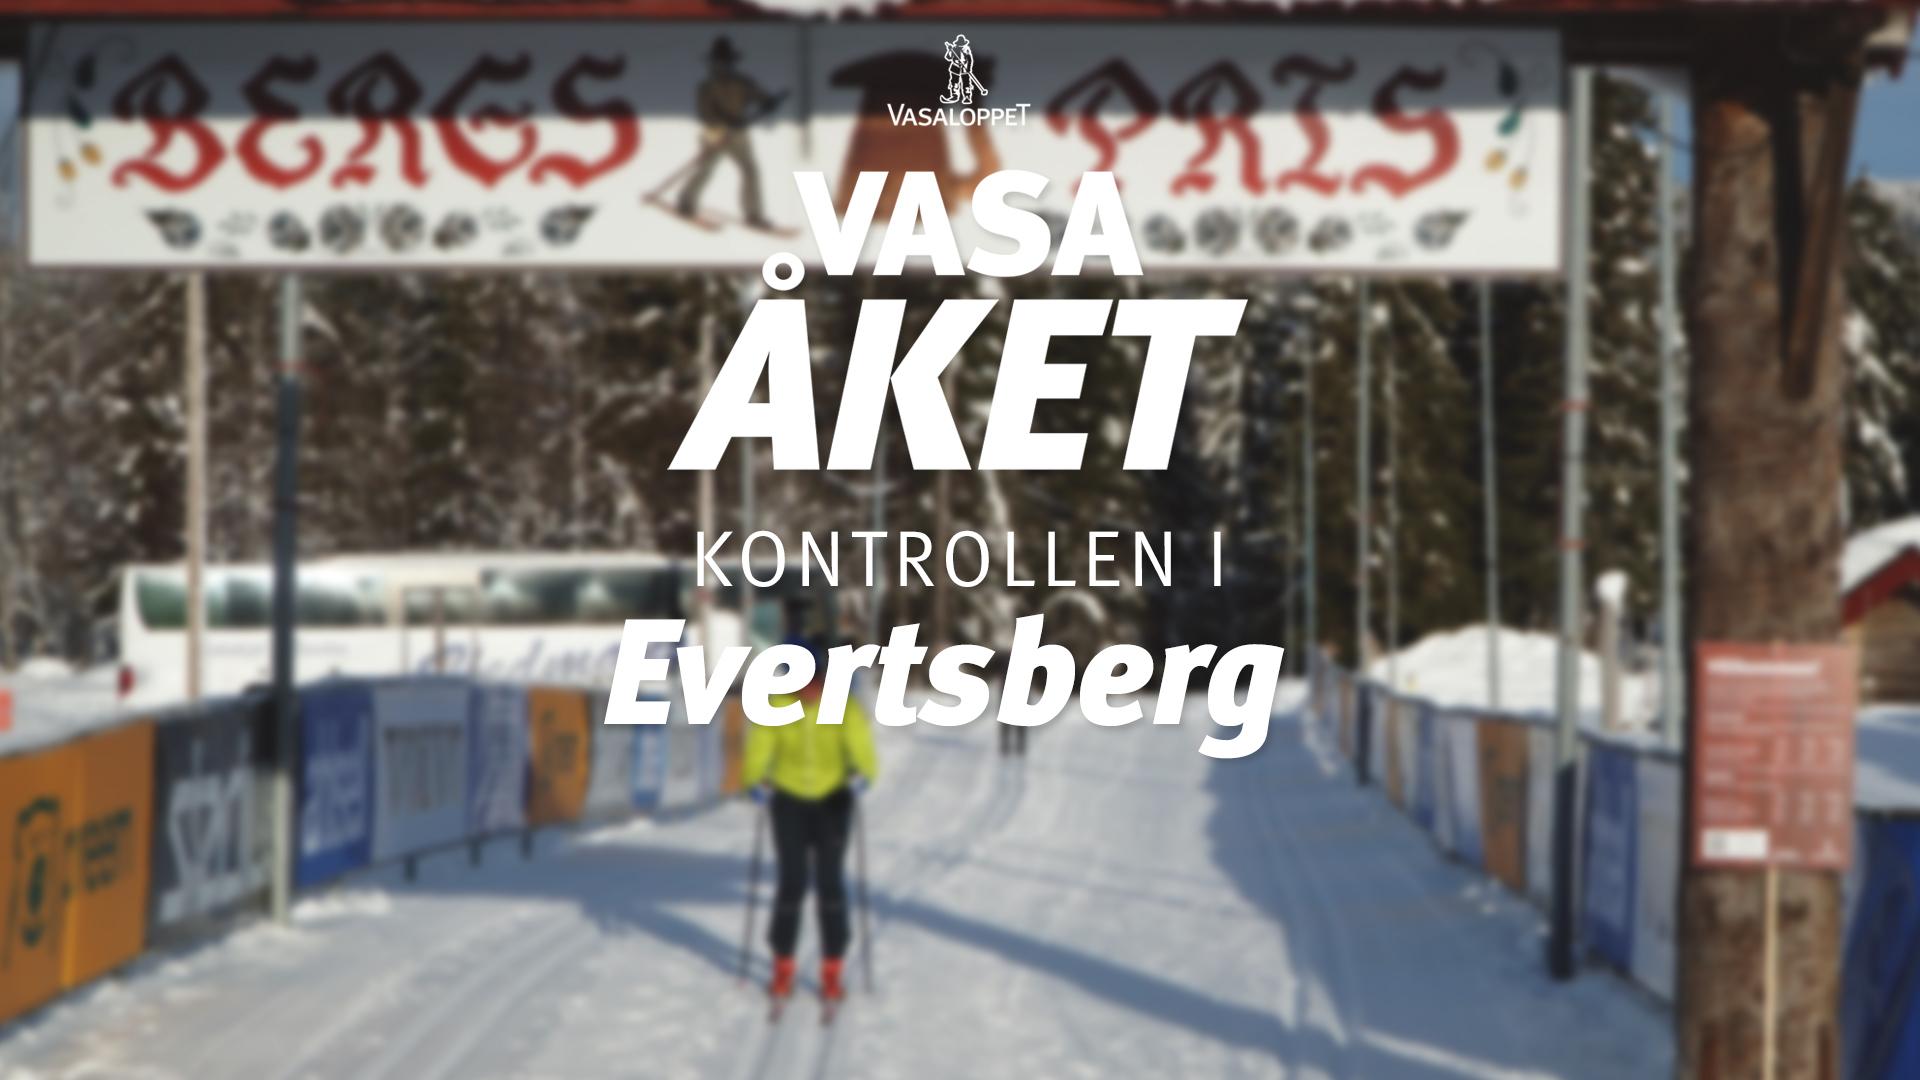 1 mars, 2021 – Evertsberg